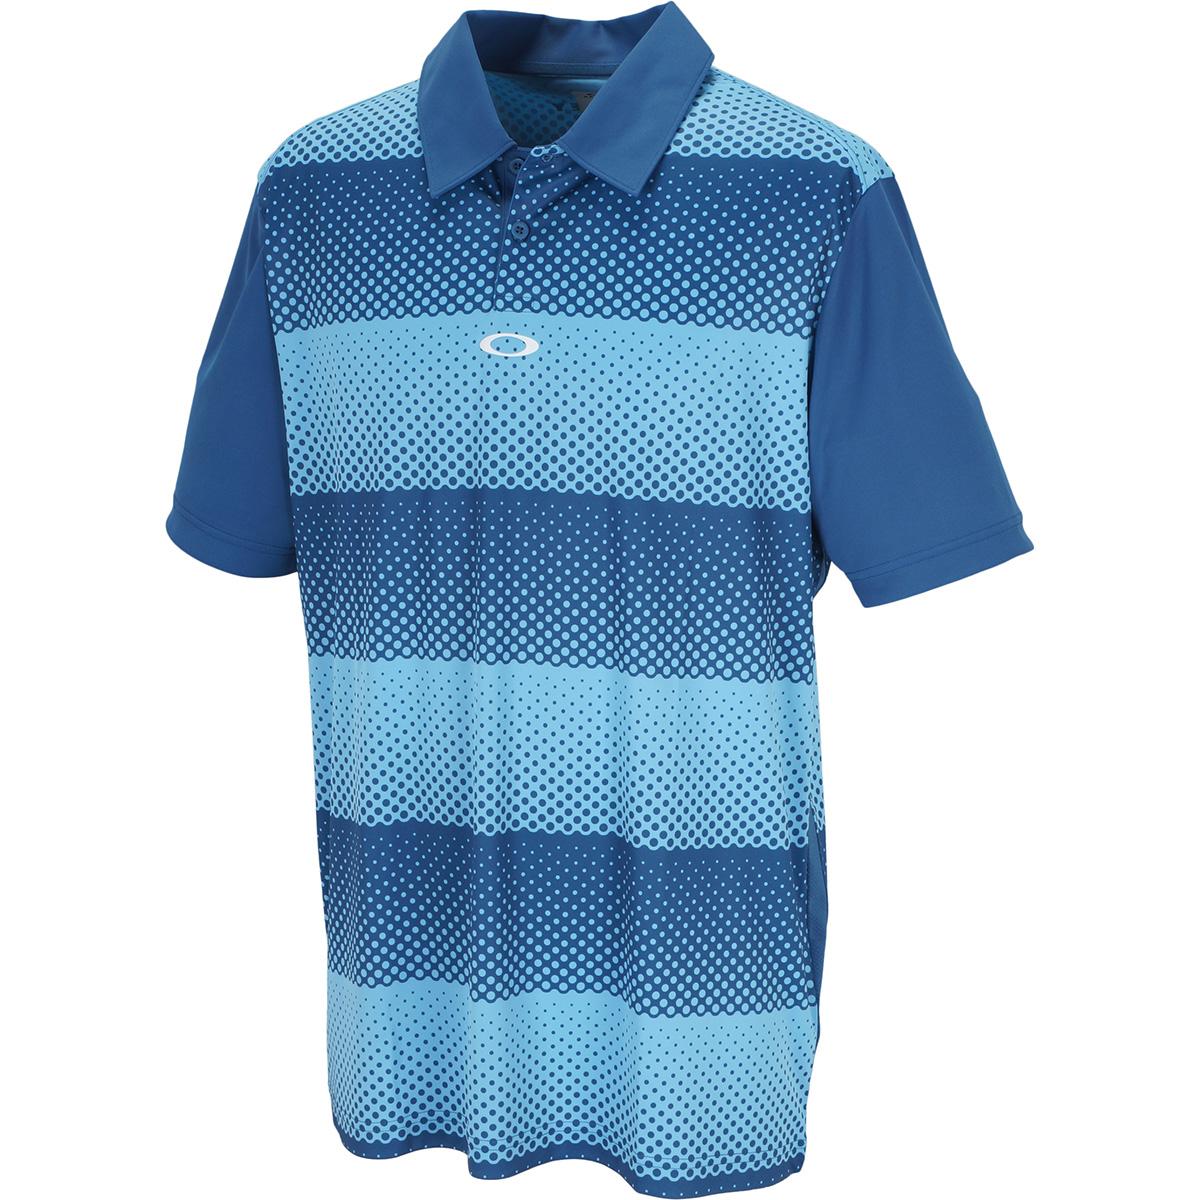 DOT STRIPES 半袖ポロシャツ